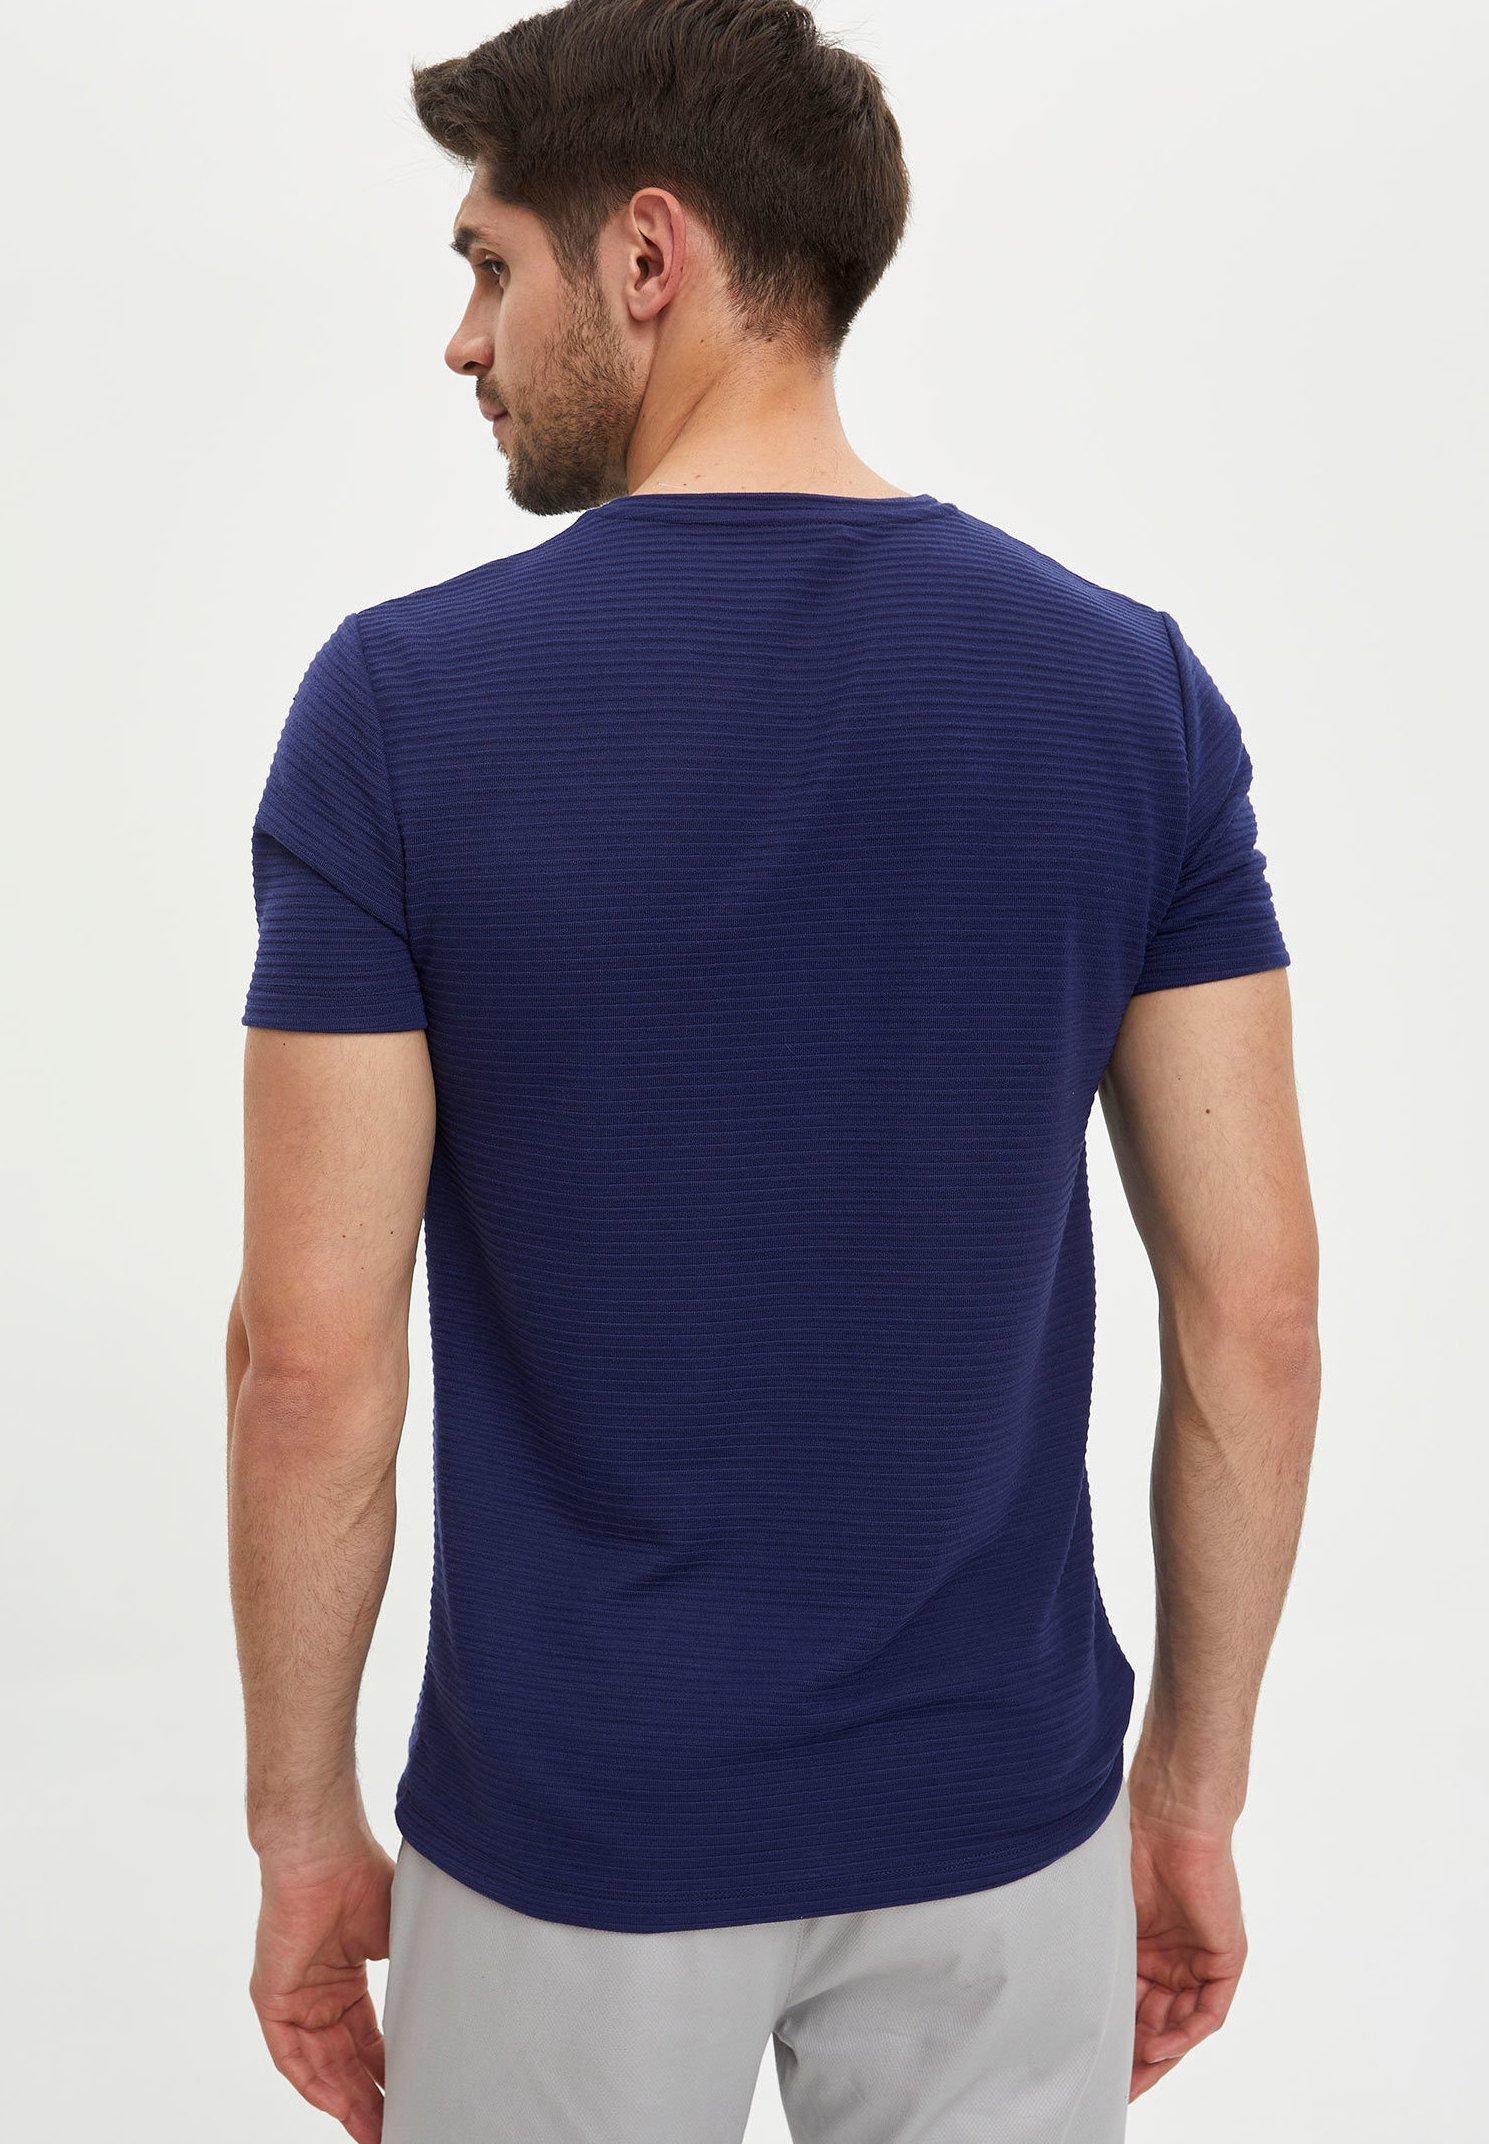 DeFacto Basic T-shirt - indigo mvfic